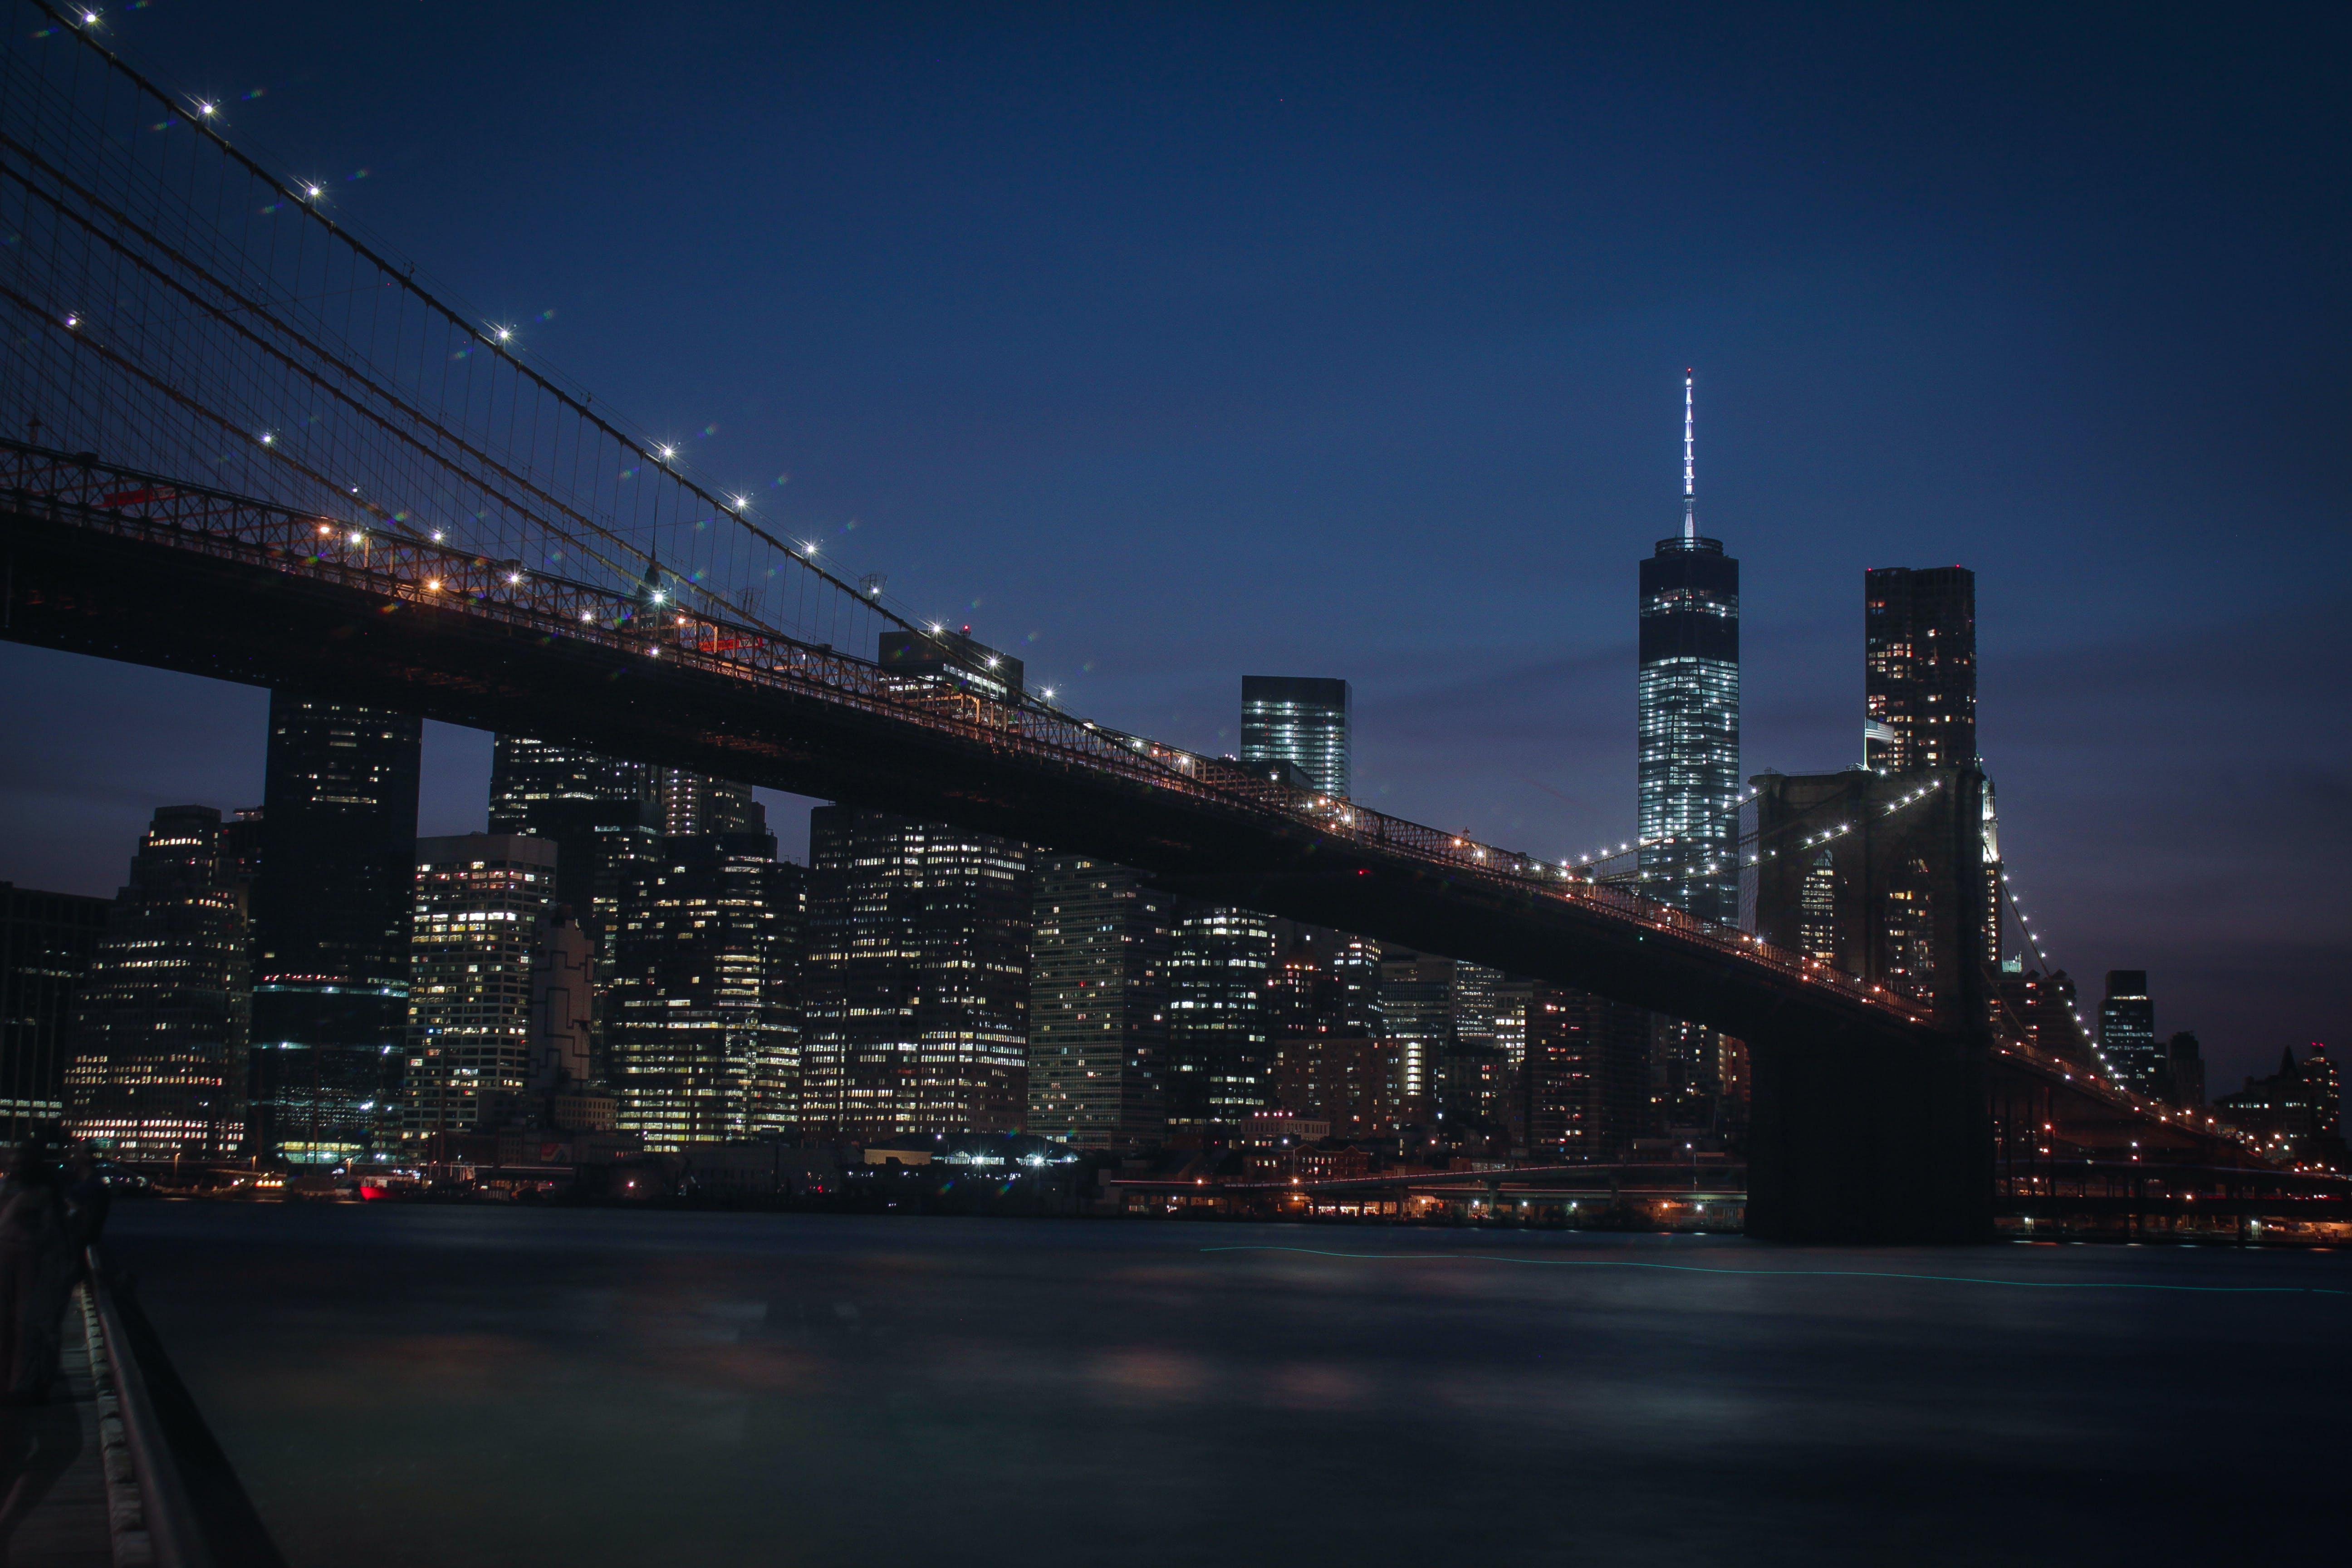 Gratis arkivbilde med bro, brooklyn bridge, by, bygning